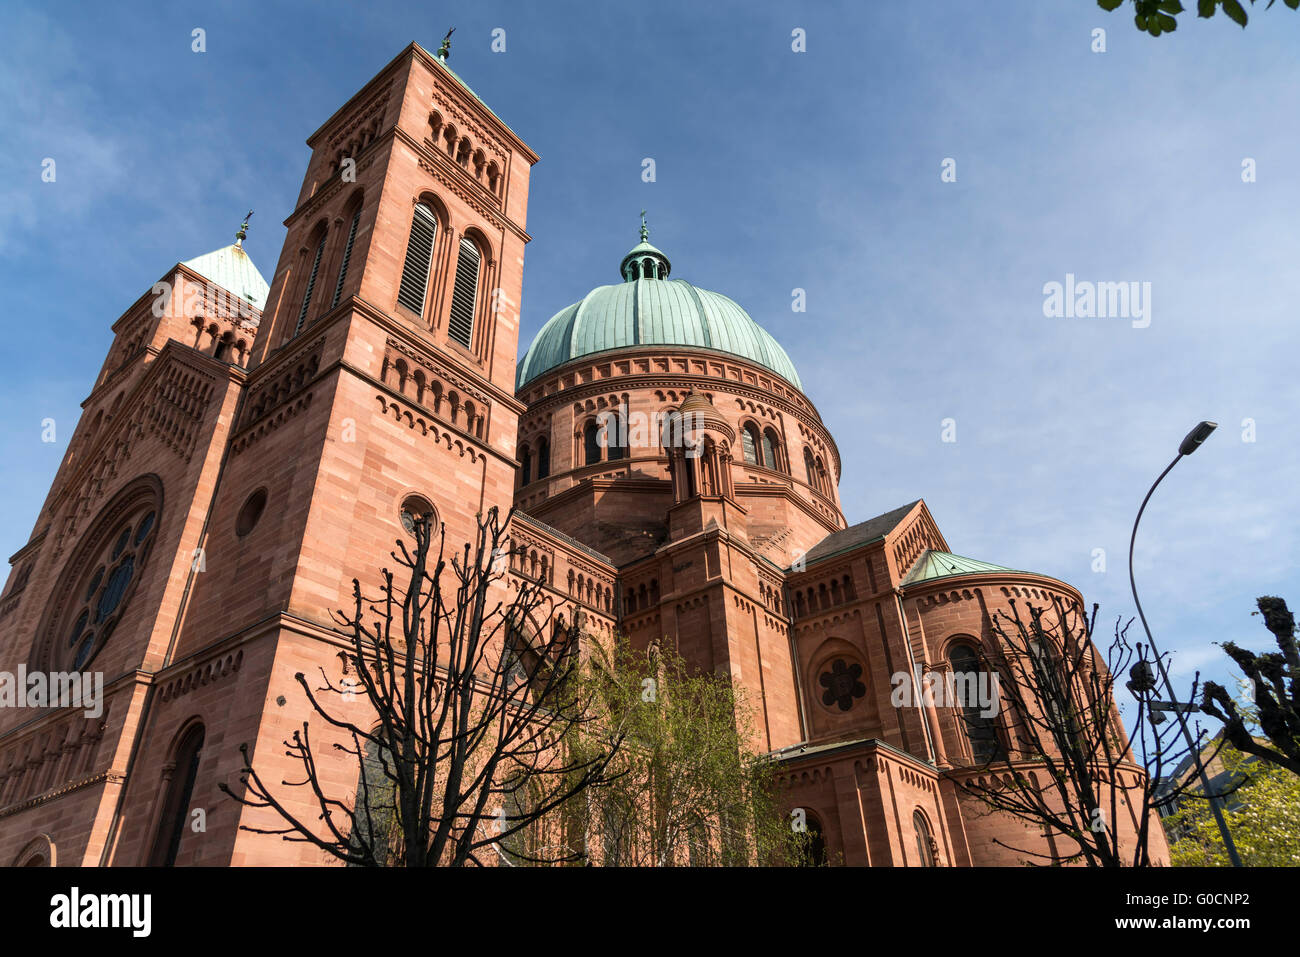 the catholic Saint-Pierre-le-Jeune church in Strasbourg,  Alsace, France - Stock Image